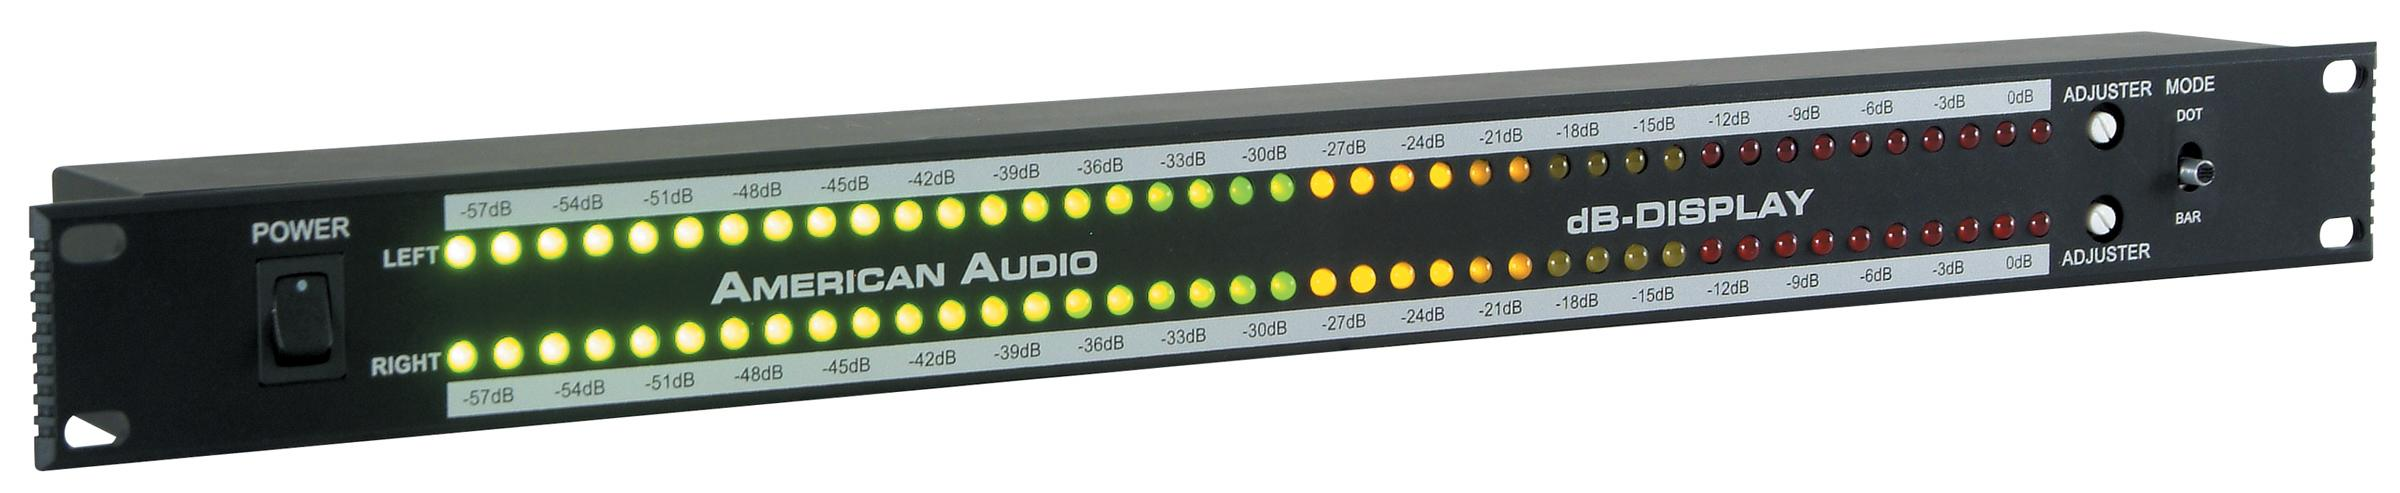 amazon   american audio db metersoundactivated rack